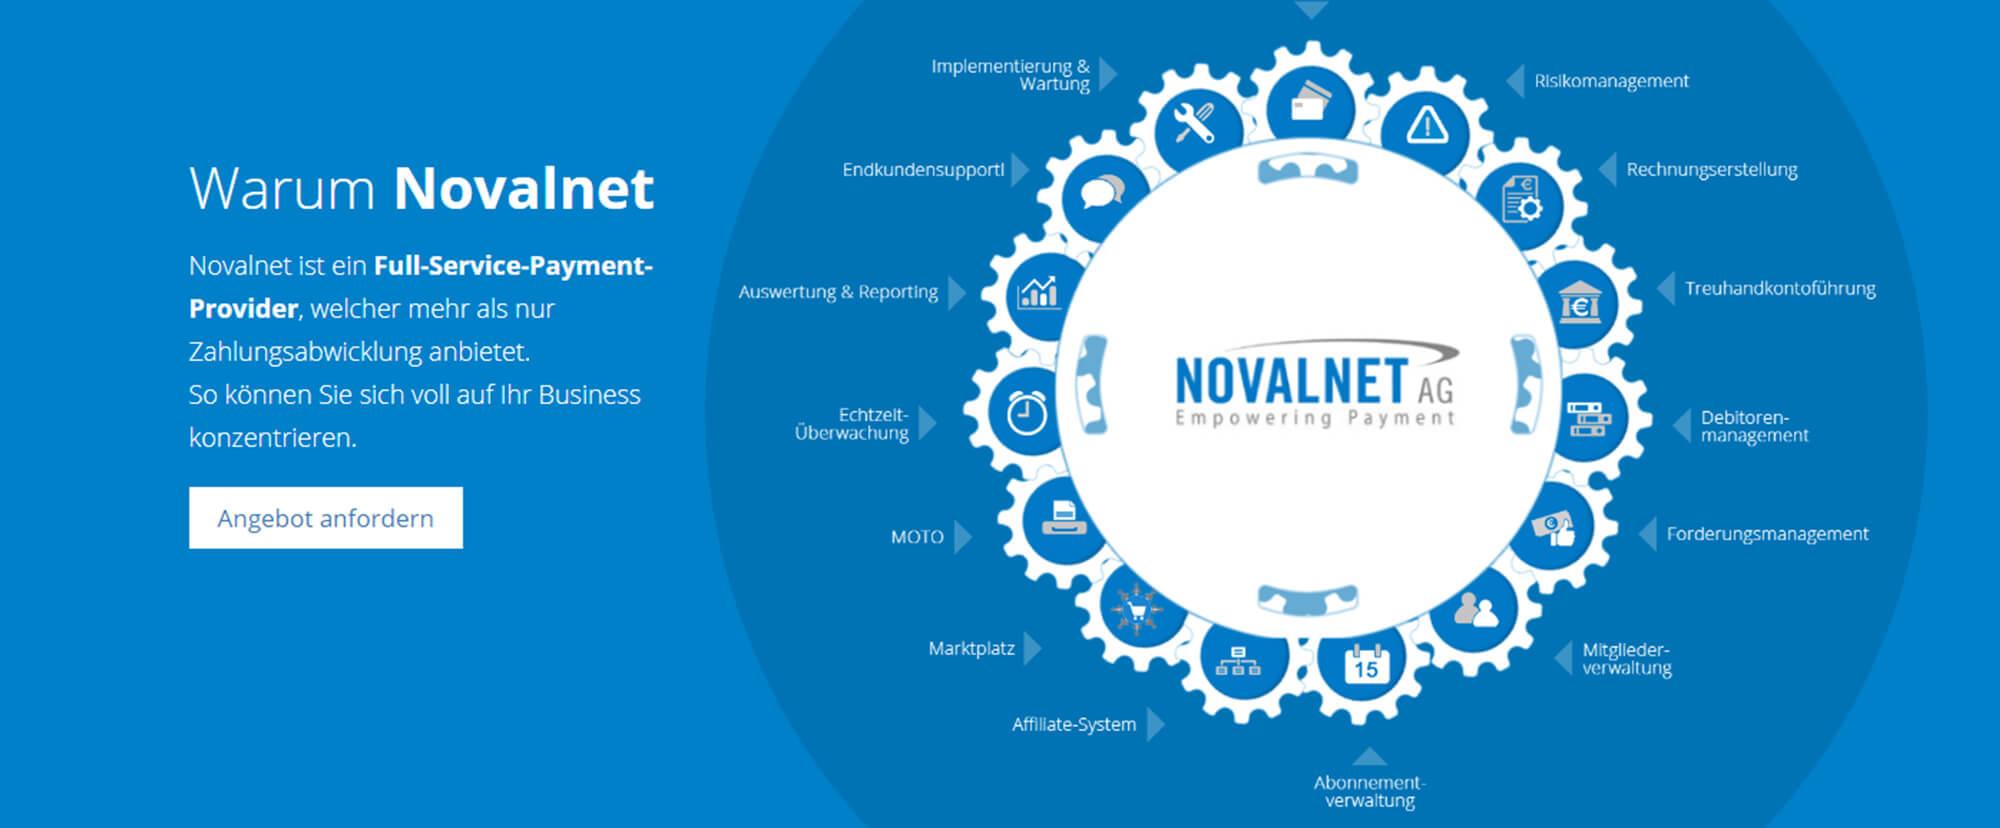 Brandcrock-Novalnet service-payment-provider